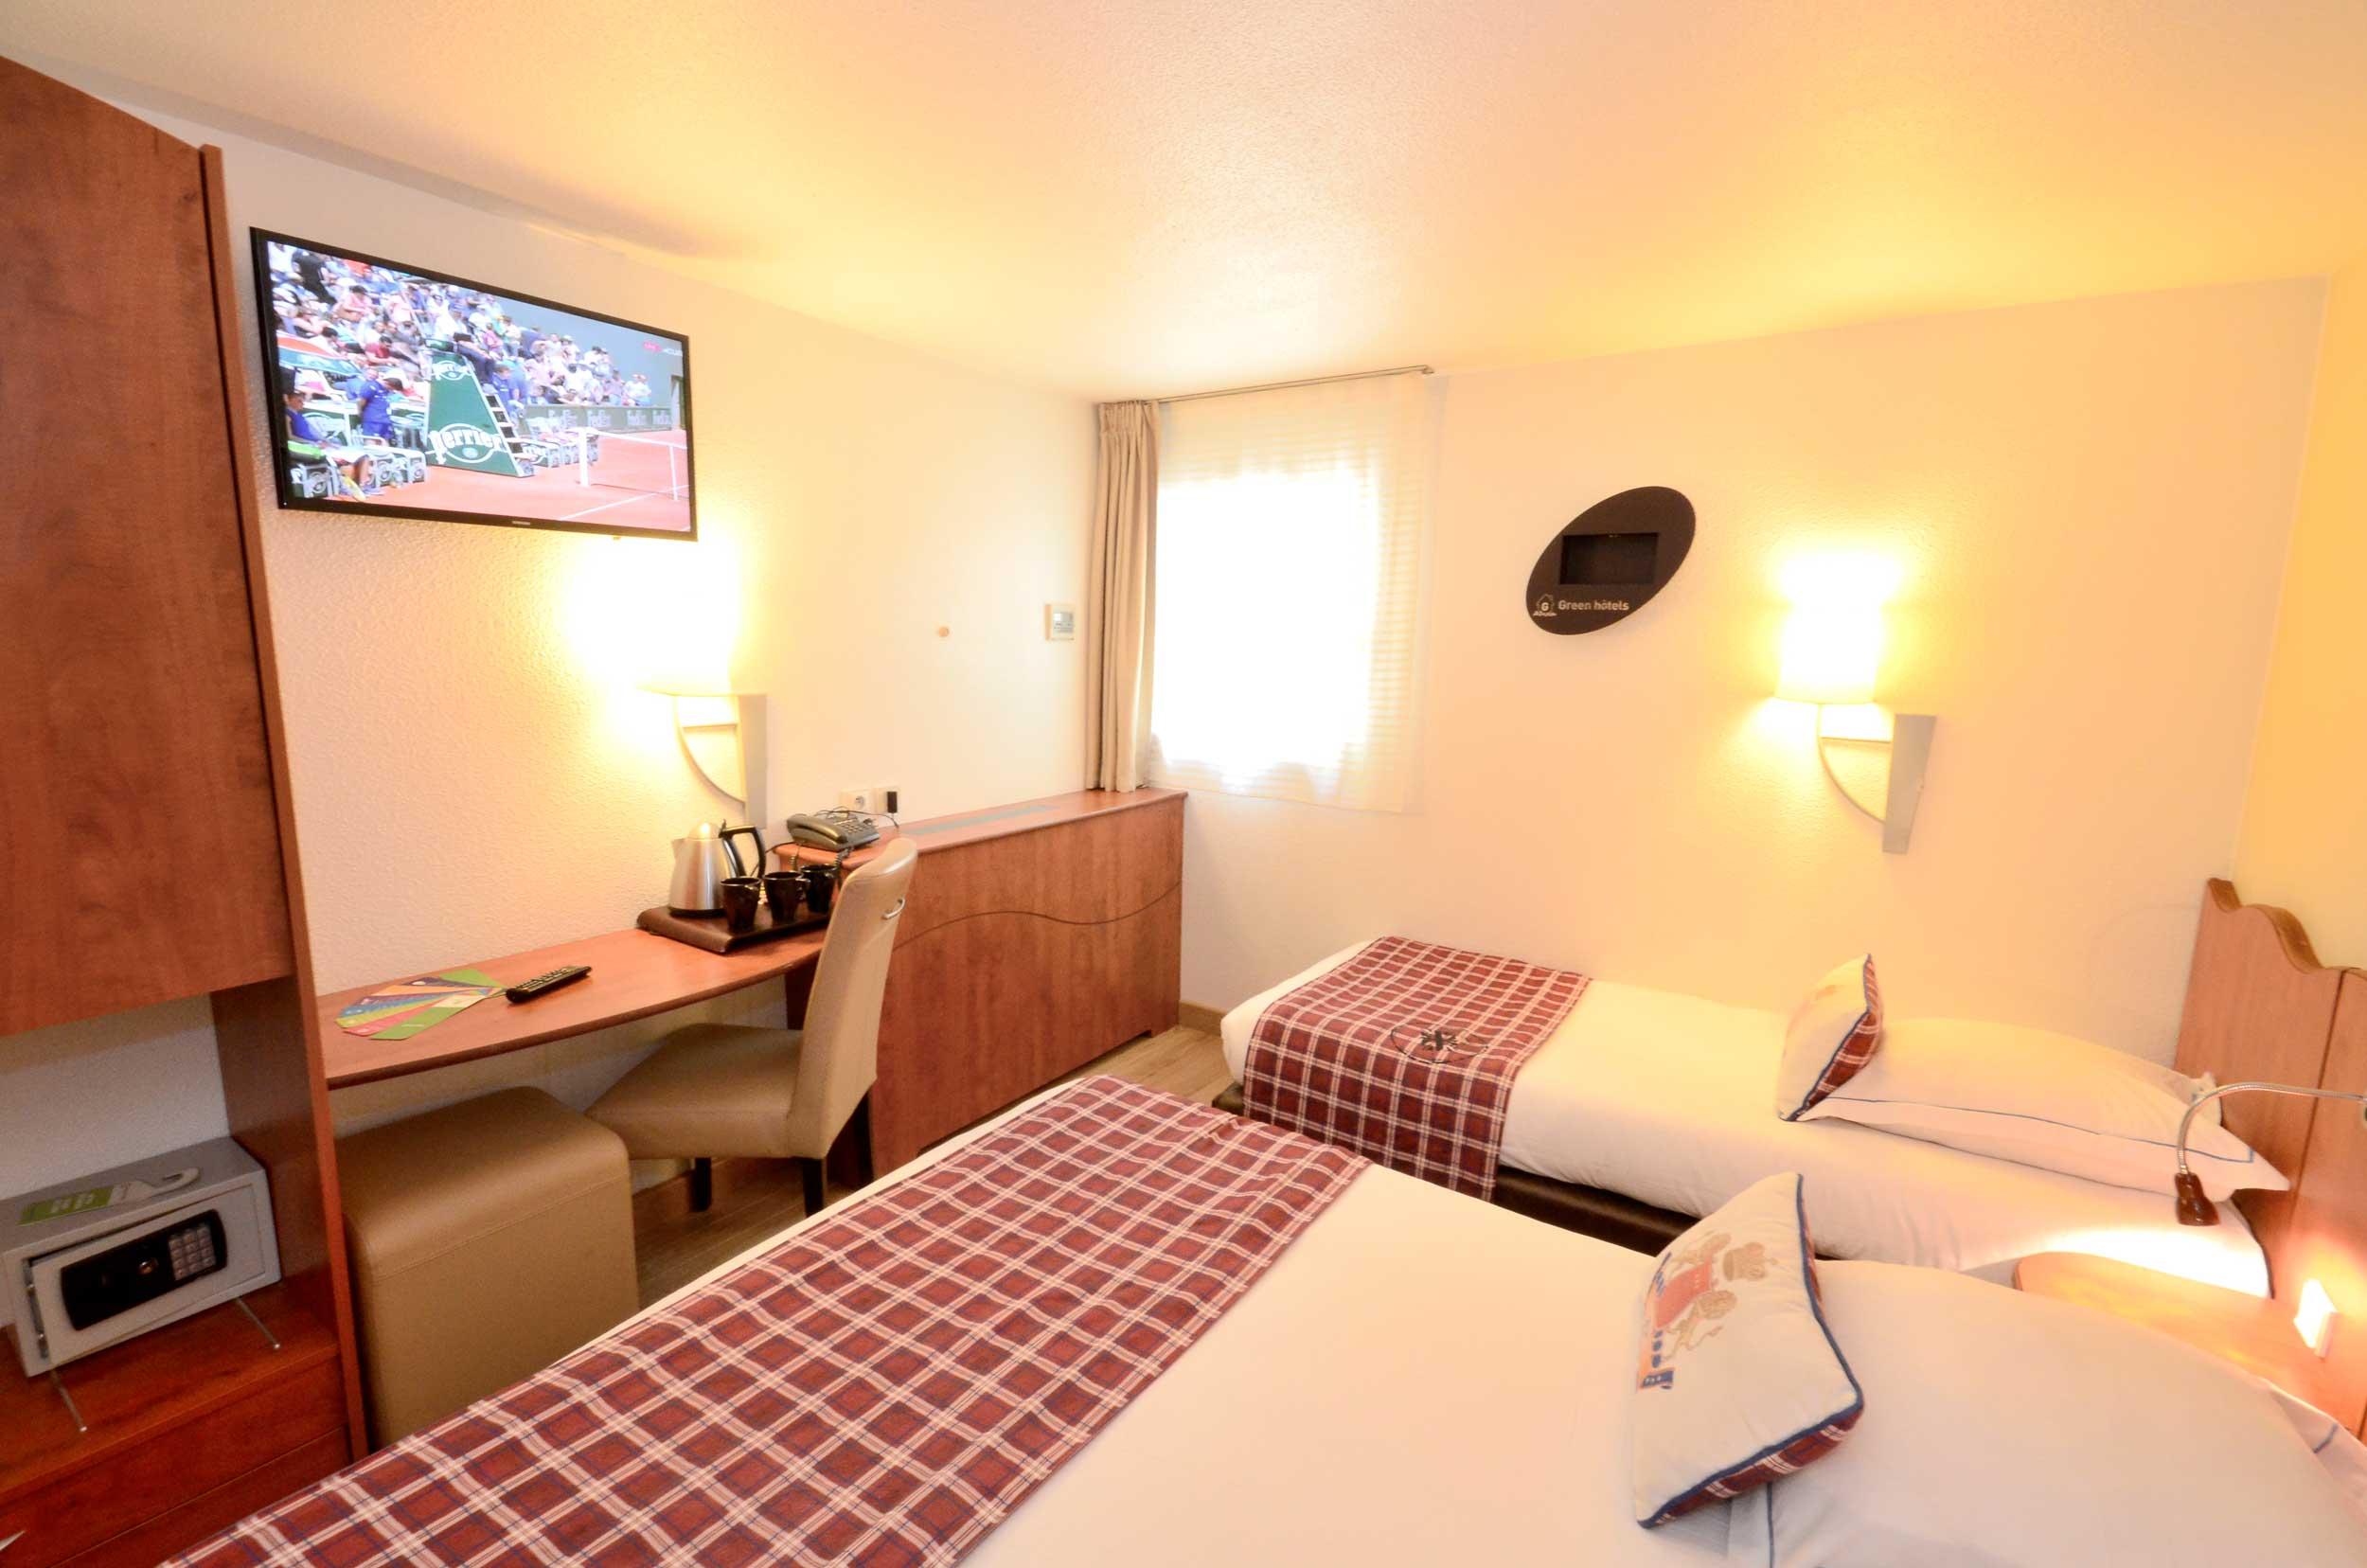 Green Hotel Sainte Genevieve Des Bois - Green h u00f4tels Chambre Twin